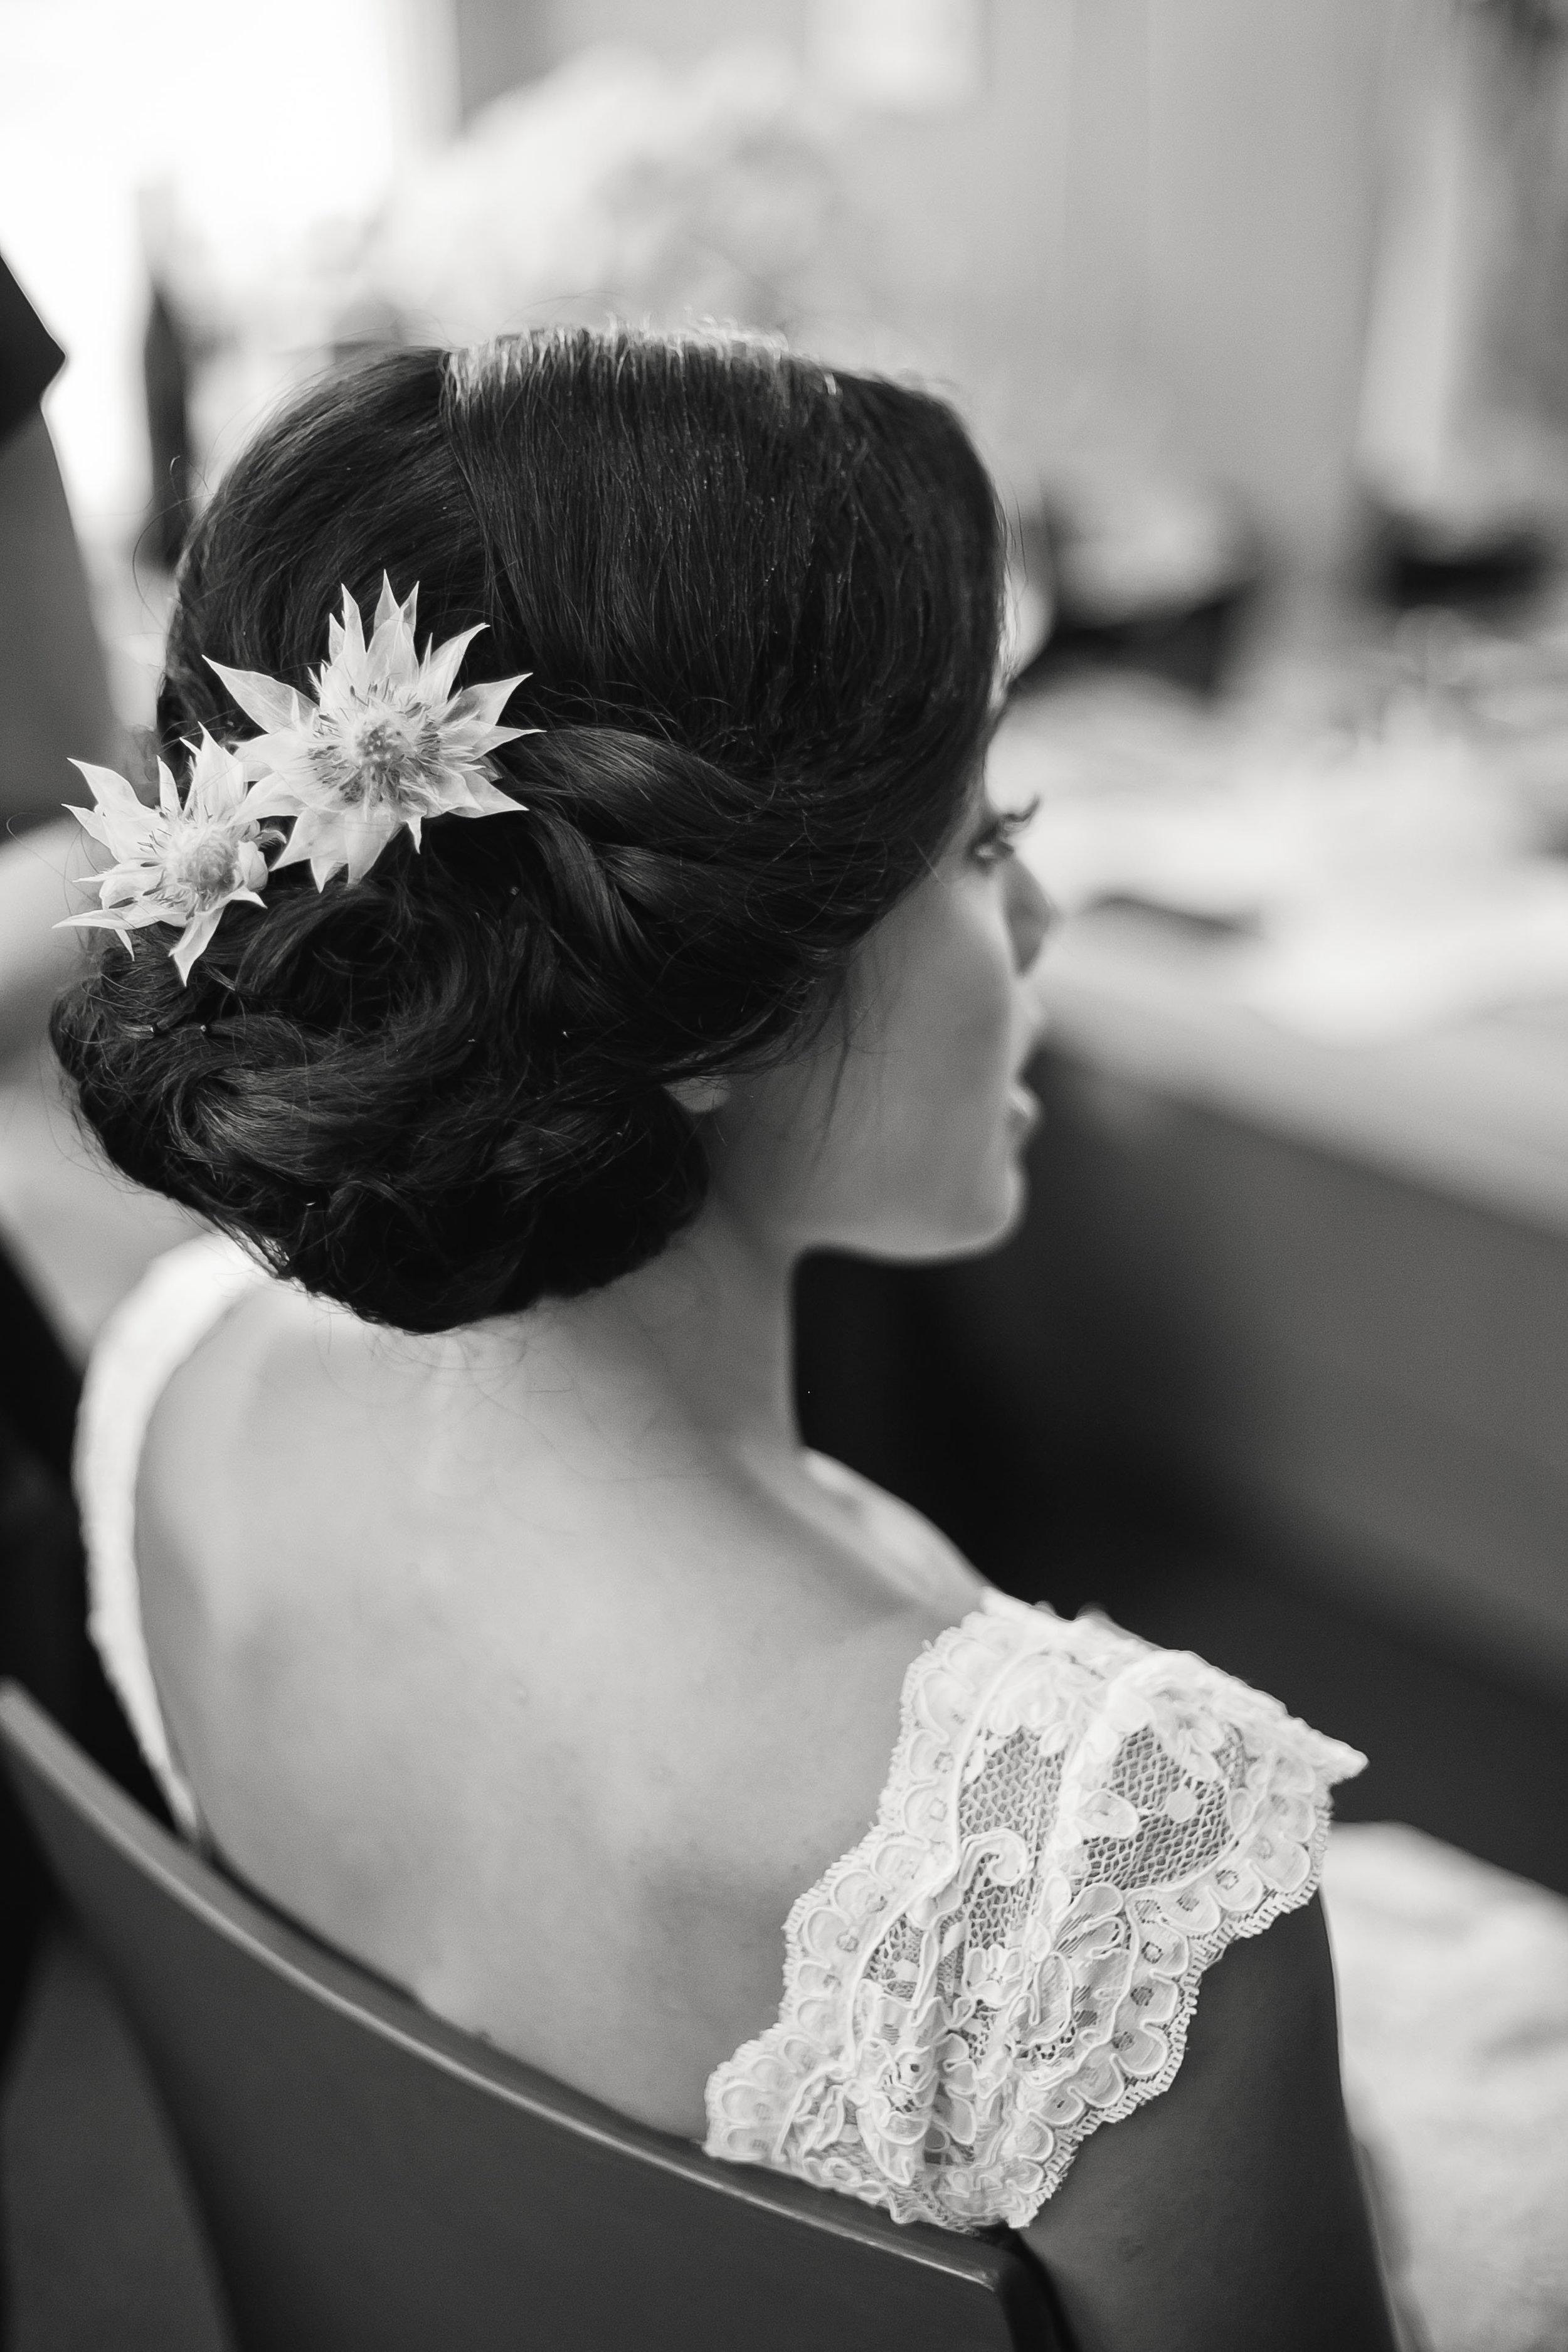 Courtney Calvin s Wedding 10 8 14-1court and cal wedding day-0332.jpg